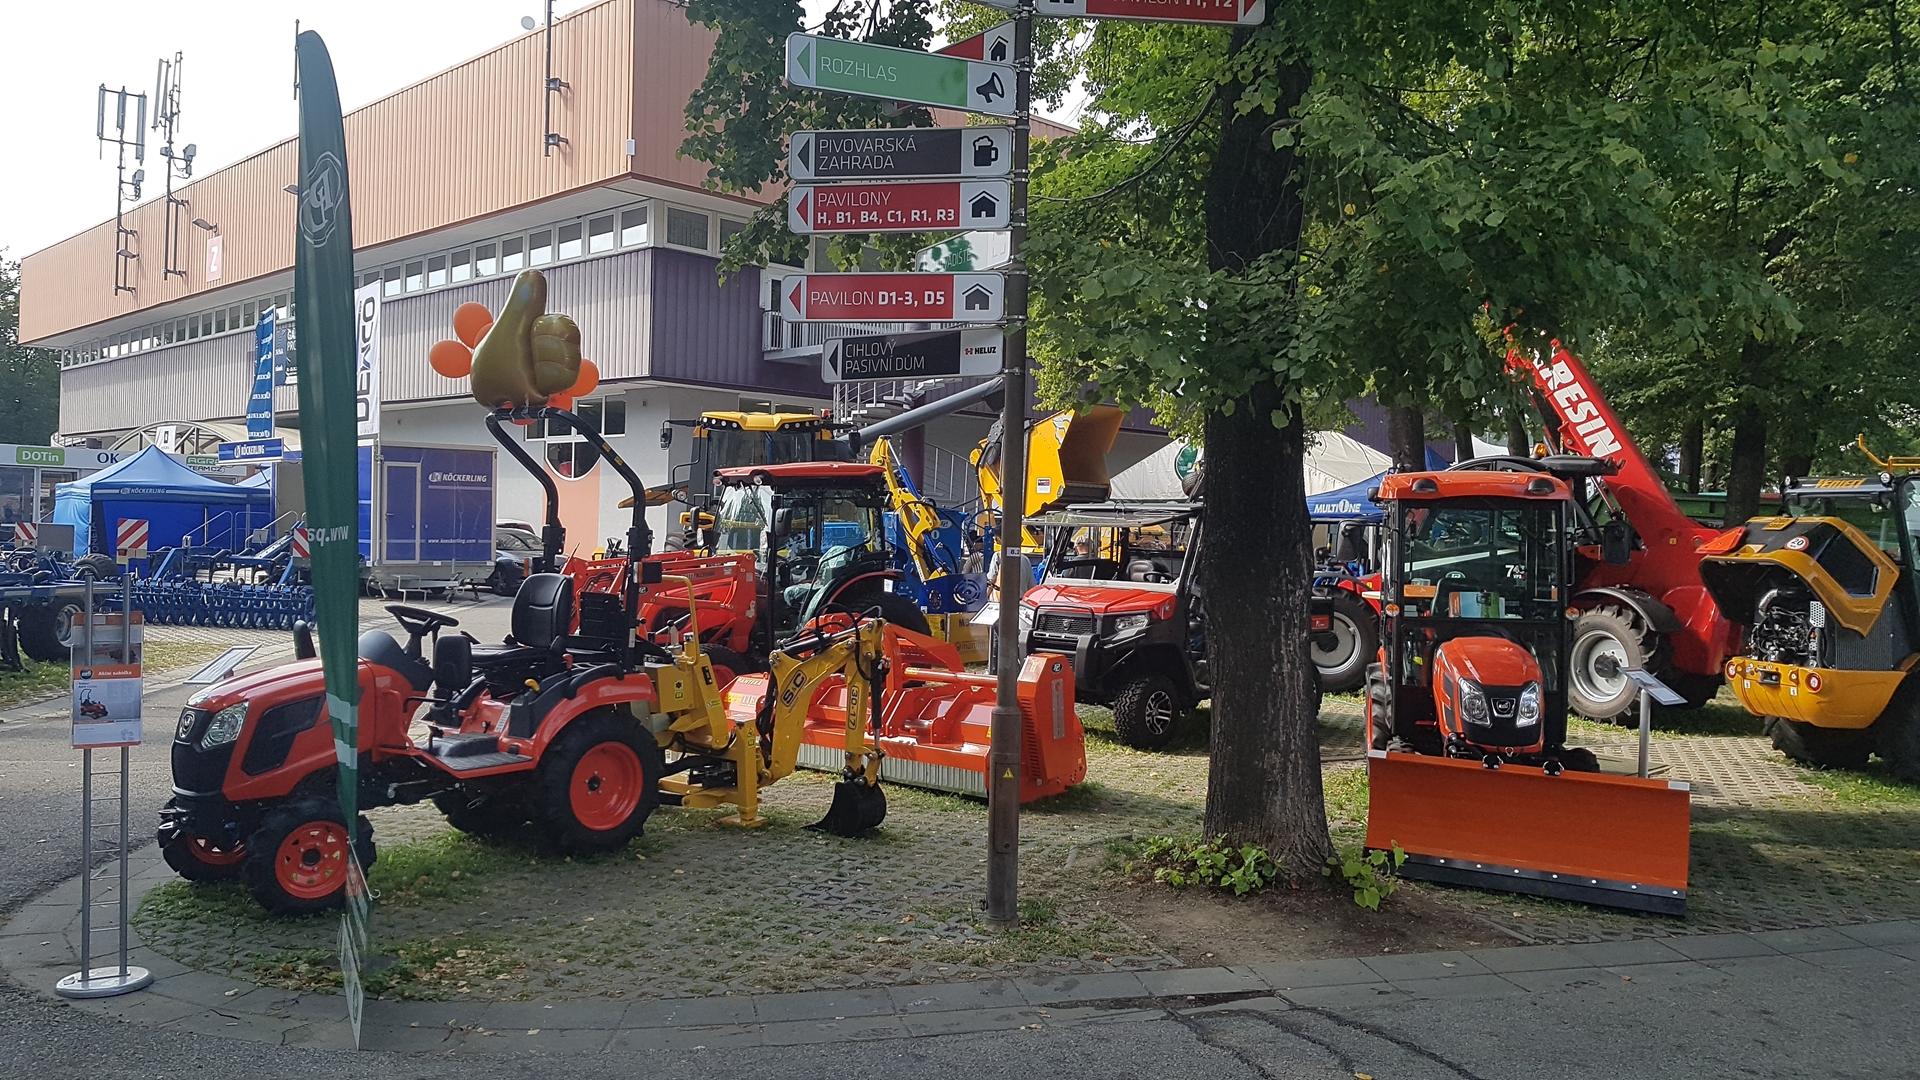 Traktory-Kioti-Zeme-Zivitelka1.jpg